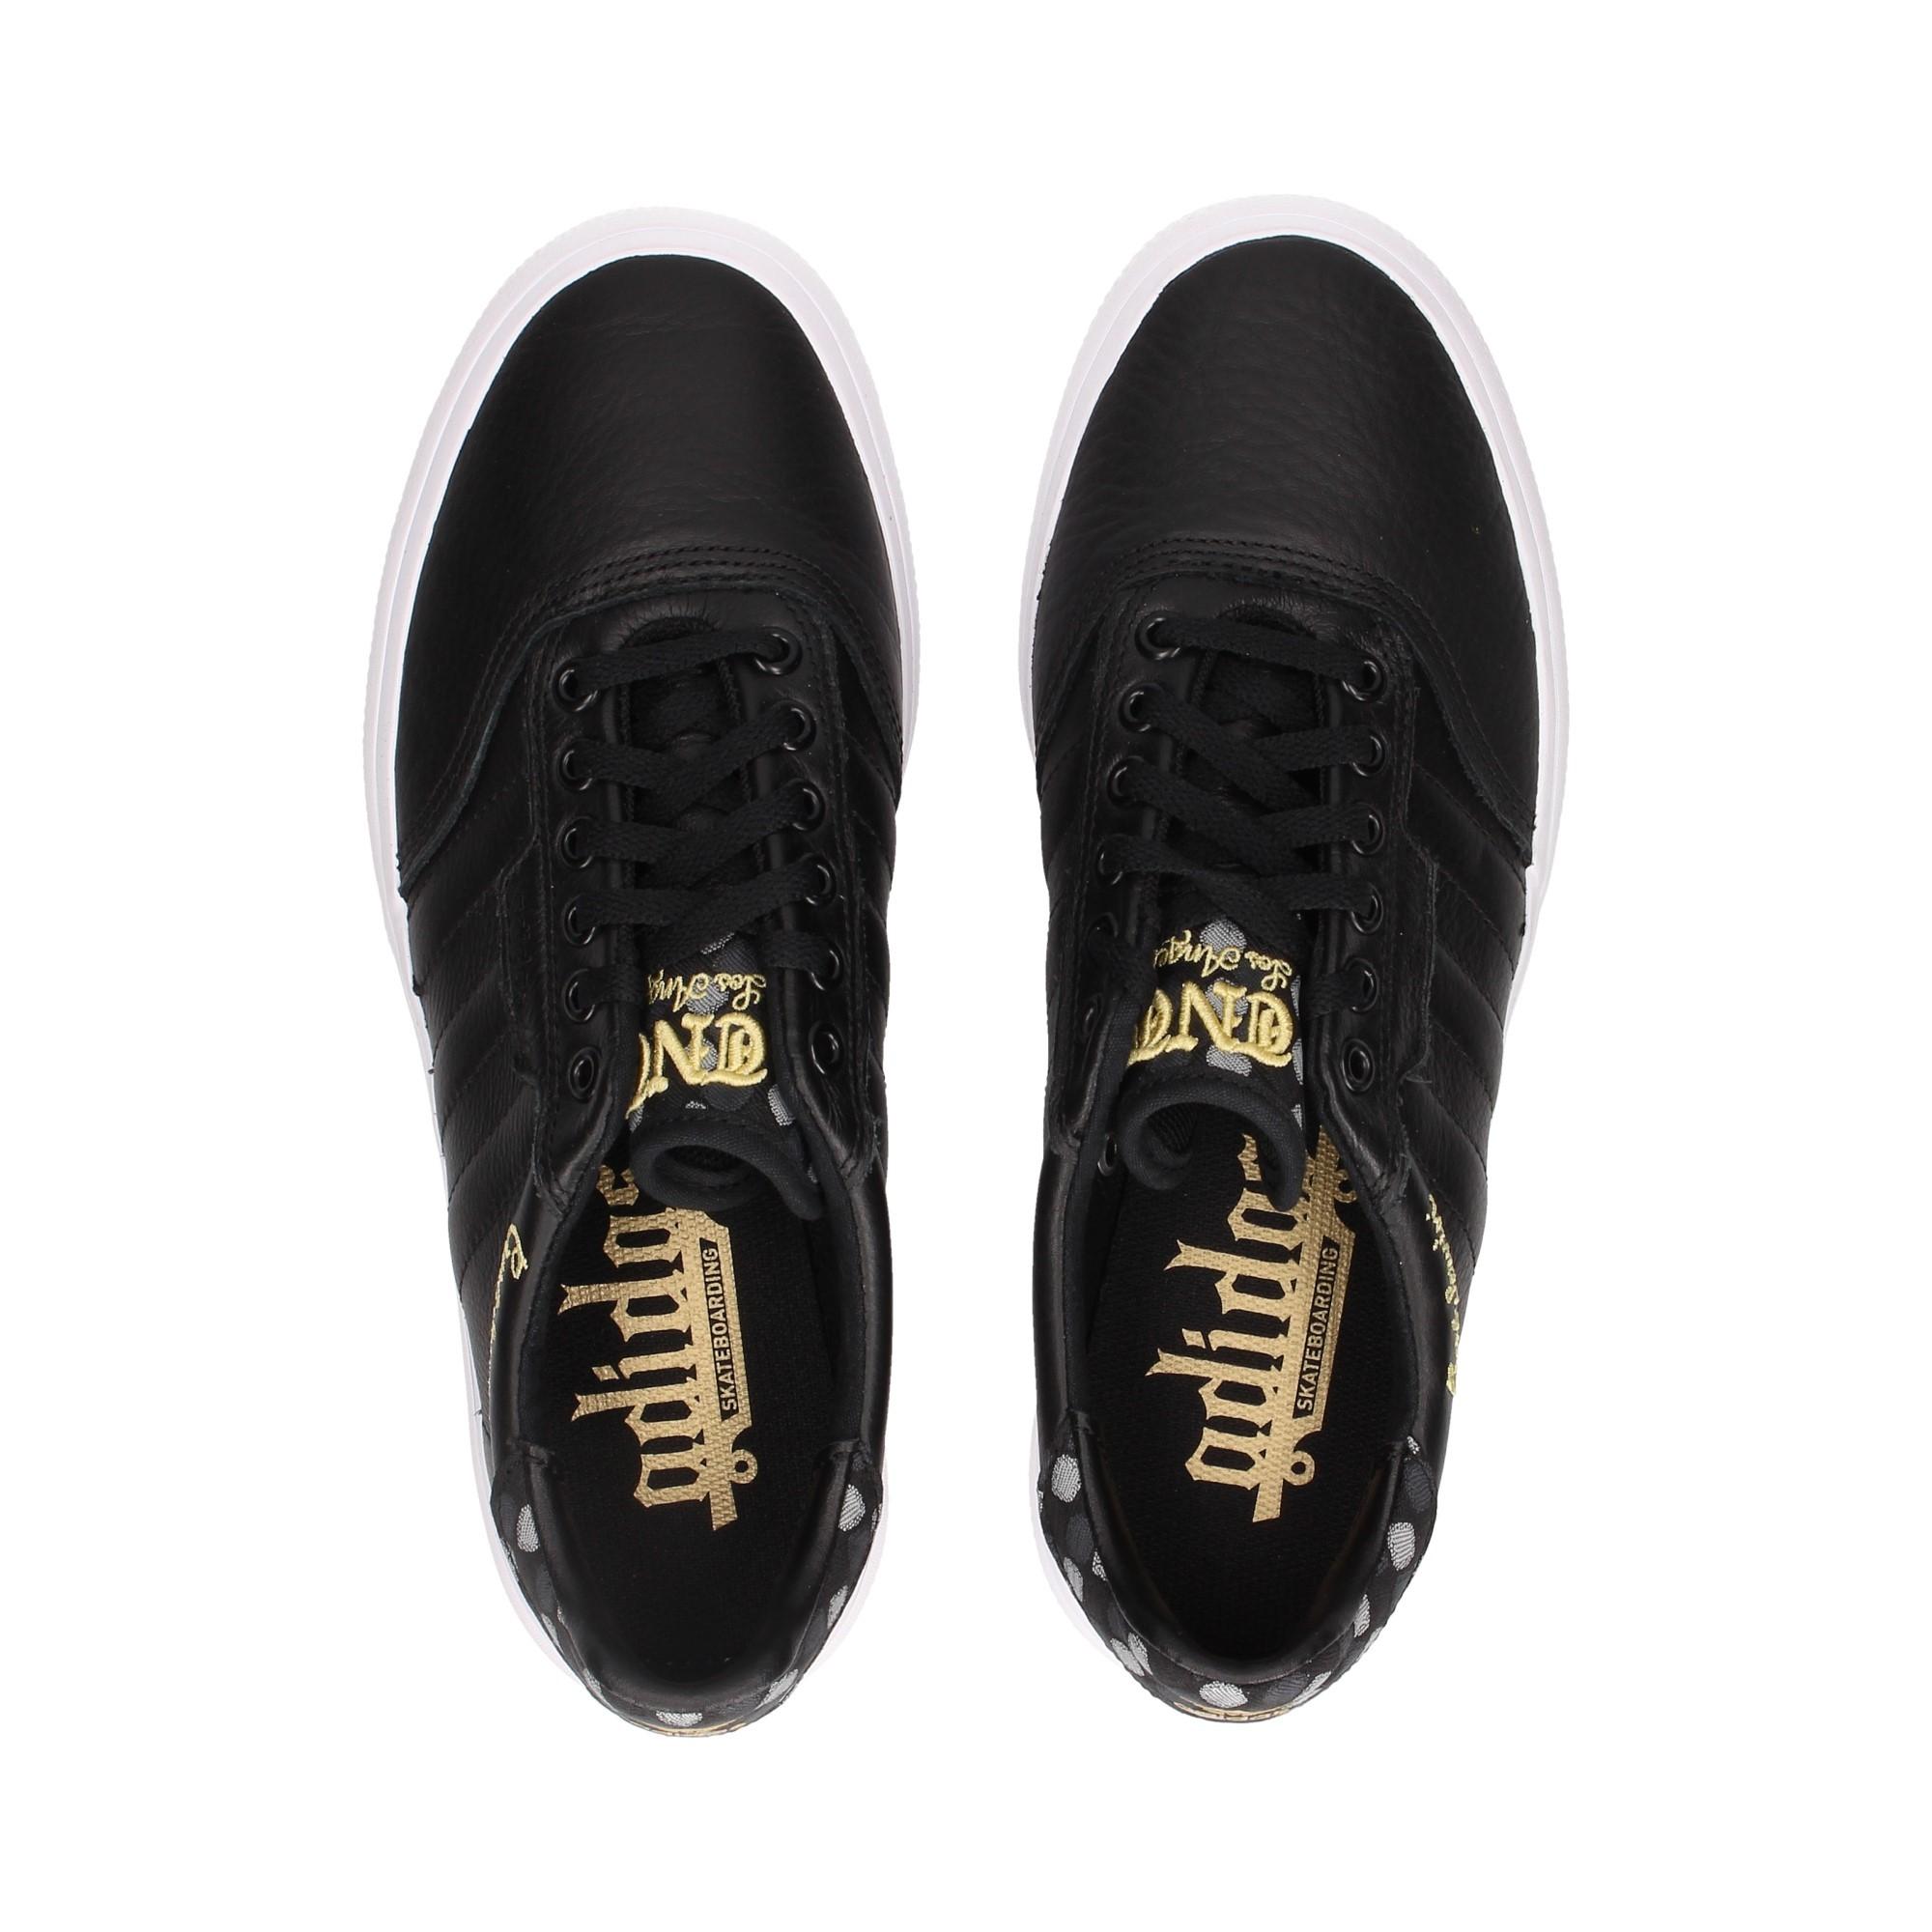 deportivo-3-bandas-negro-oro